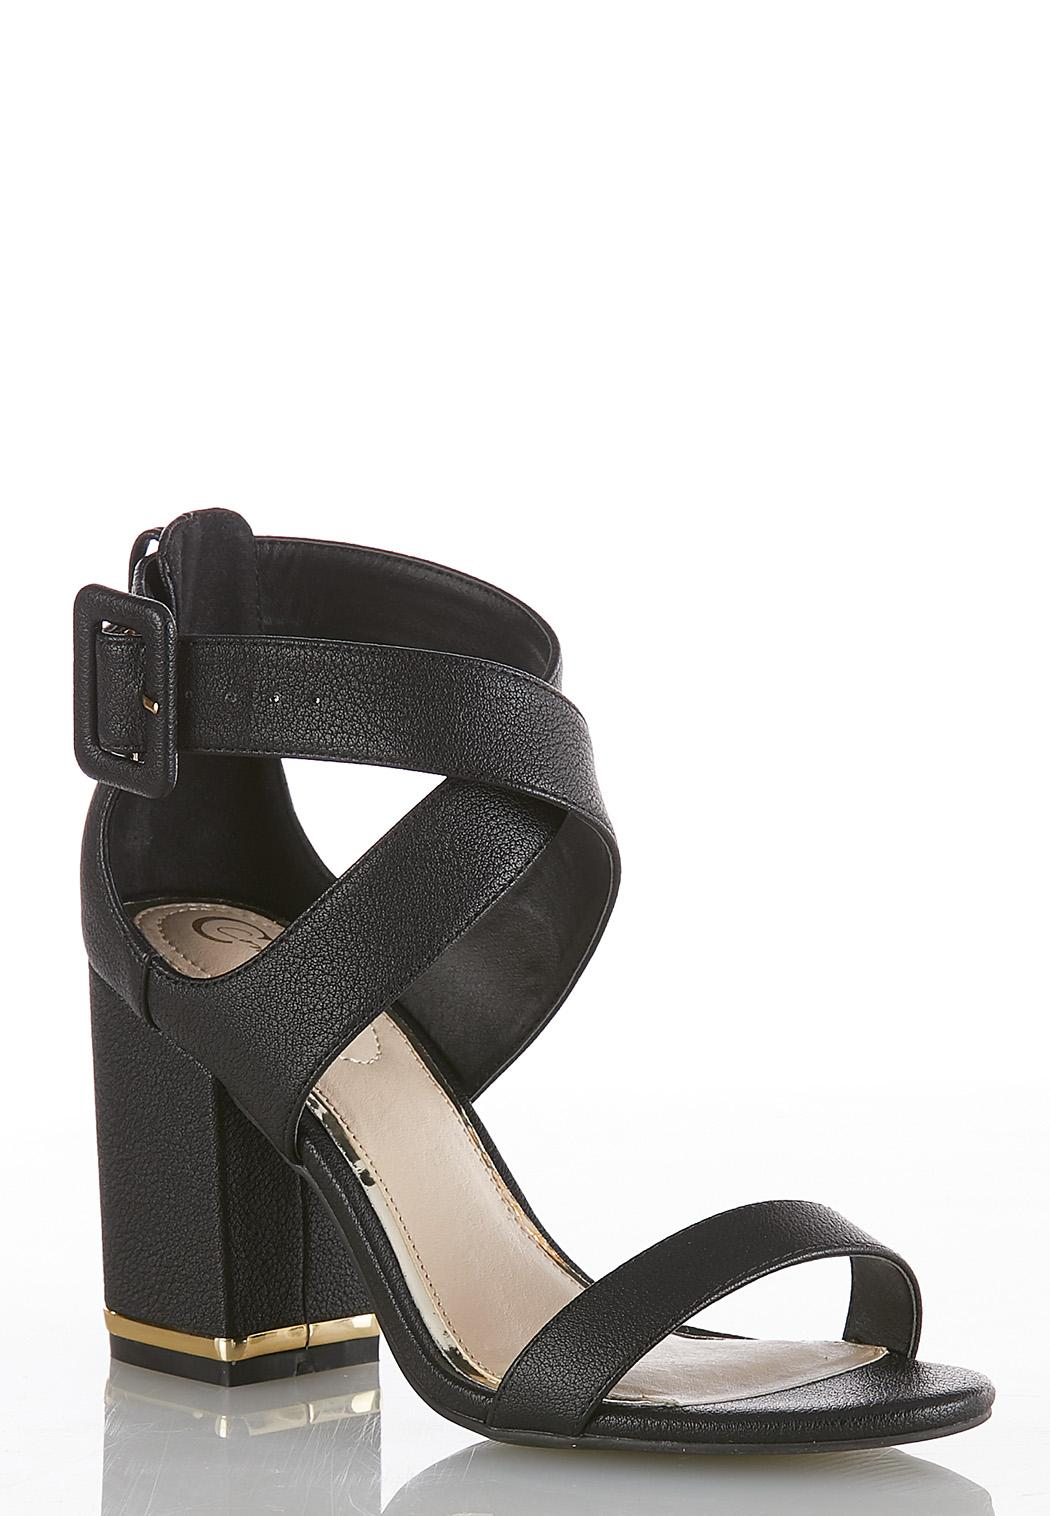 c4d6288d67 Chunky Metallic Heeled Sandals · Chunky Metallic Heeled Sandals